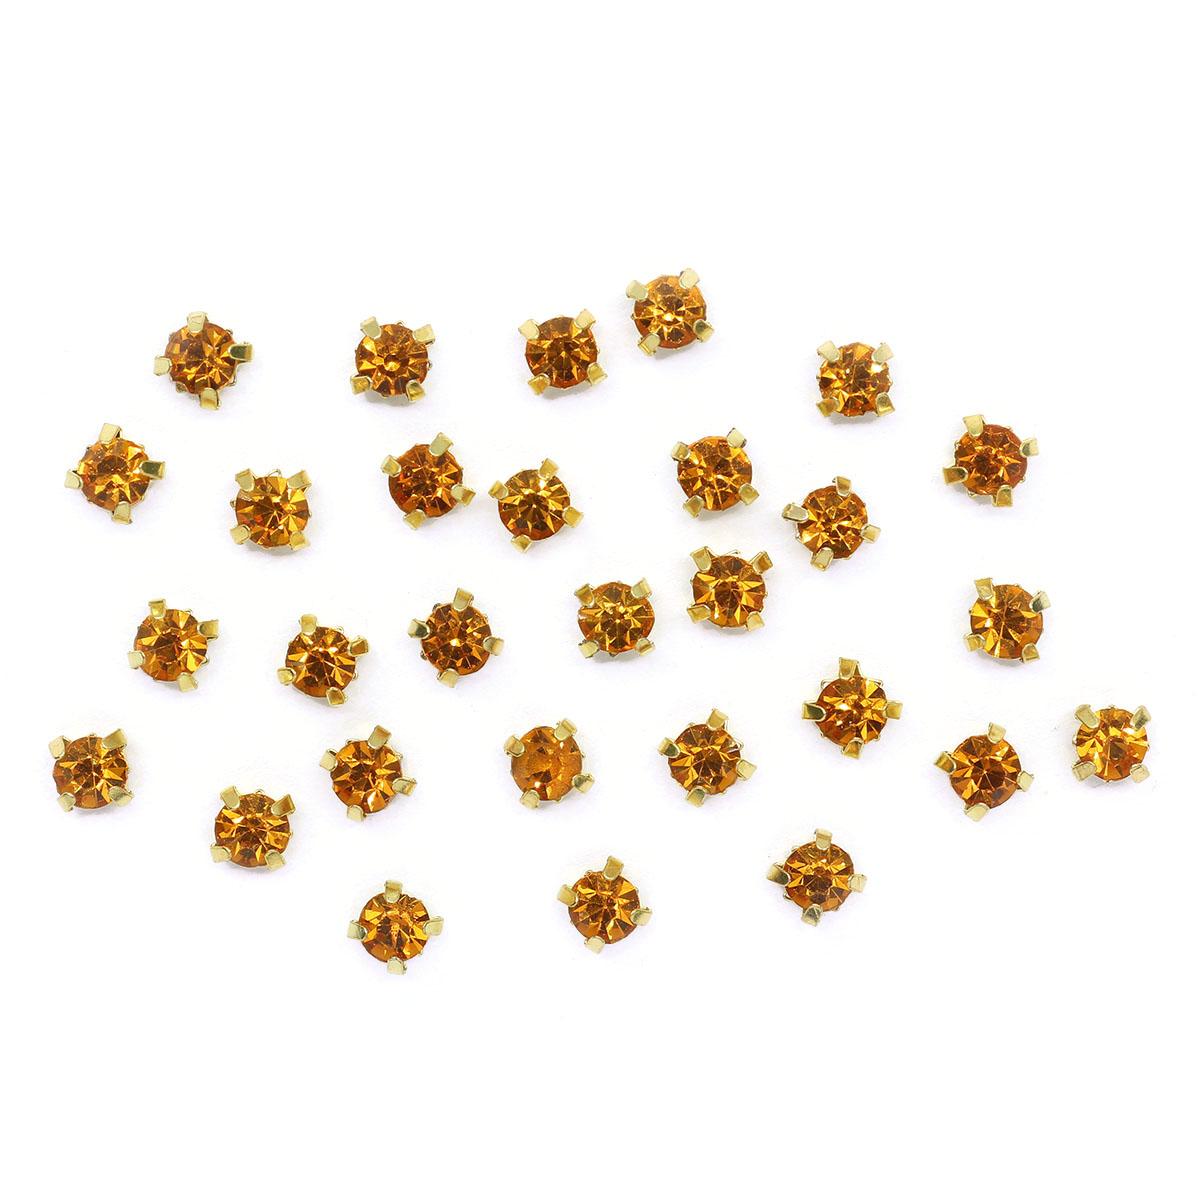 ЗЦ013НН44 Хрустальные стразы в цапах круглые (золото) медовый 4*4мм, 29-30шт/упак Астра